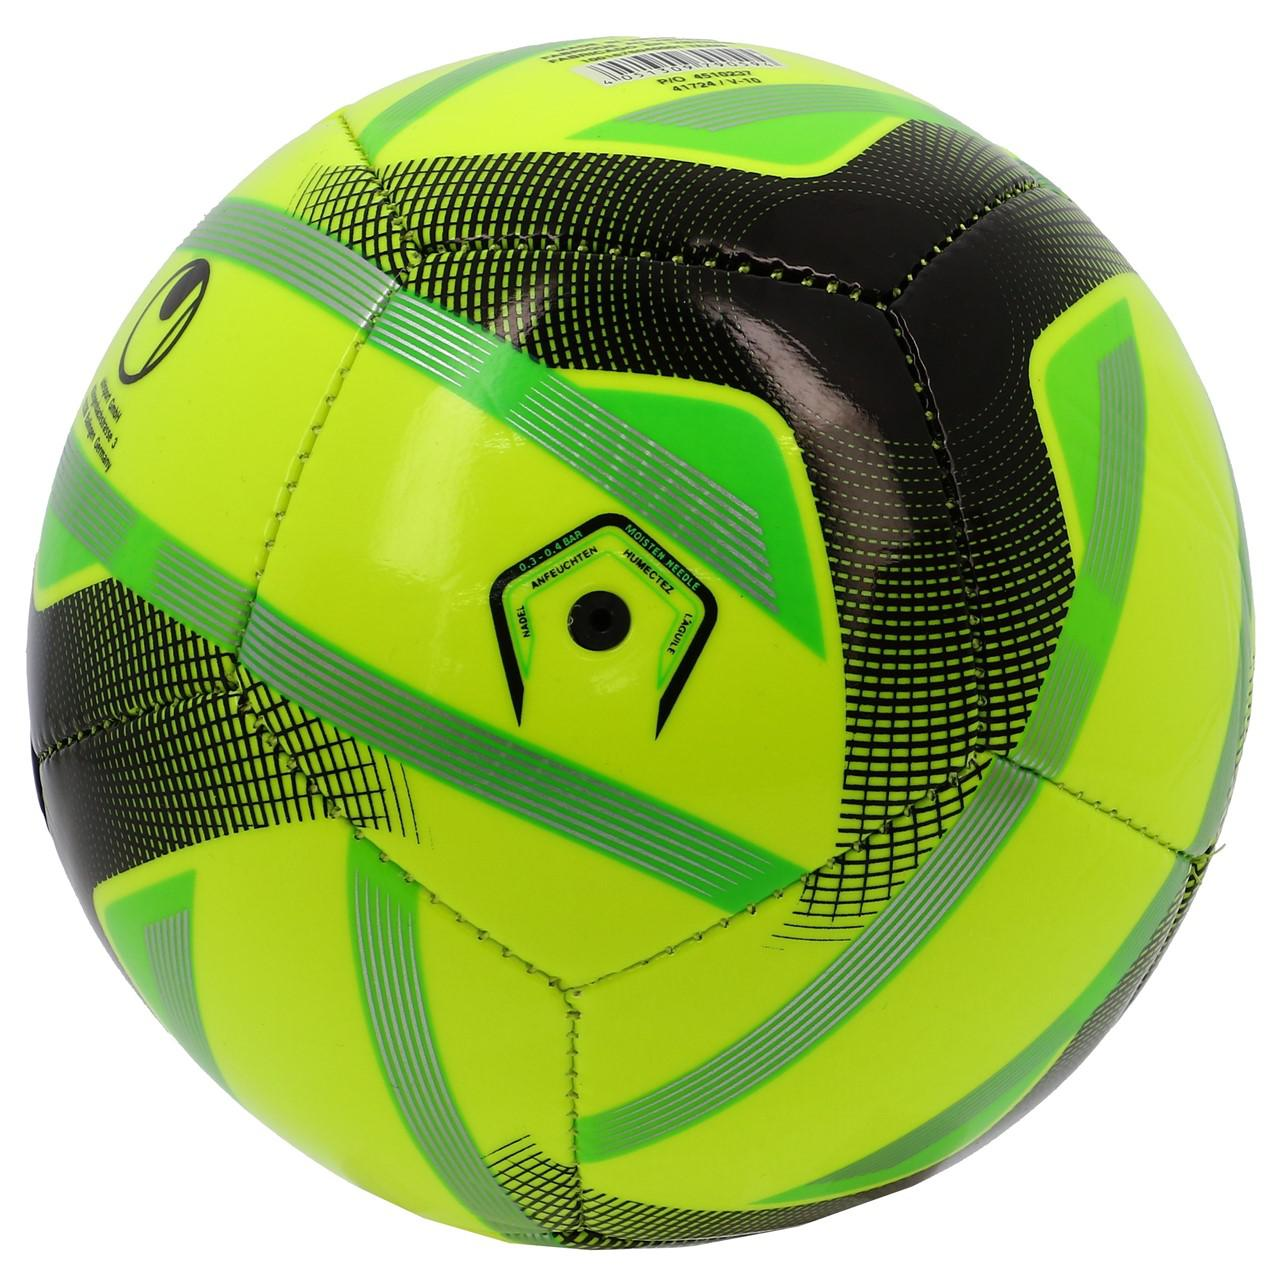 Mini-Ball-Uhlsport-Team-Mini-taille1-Yellow-50001-New thumbnail 2